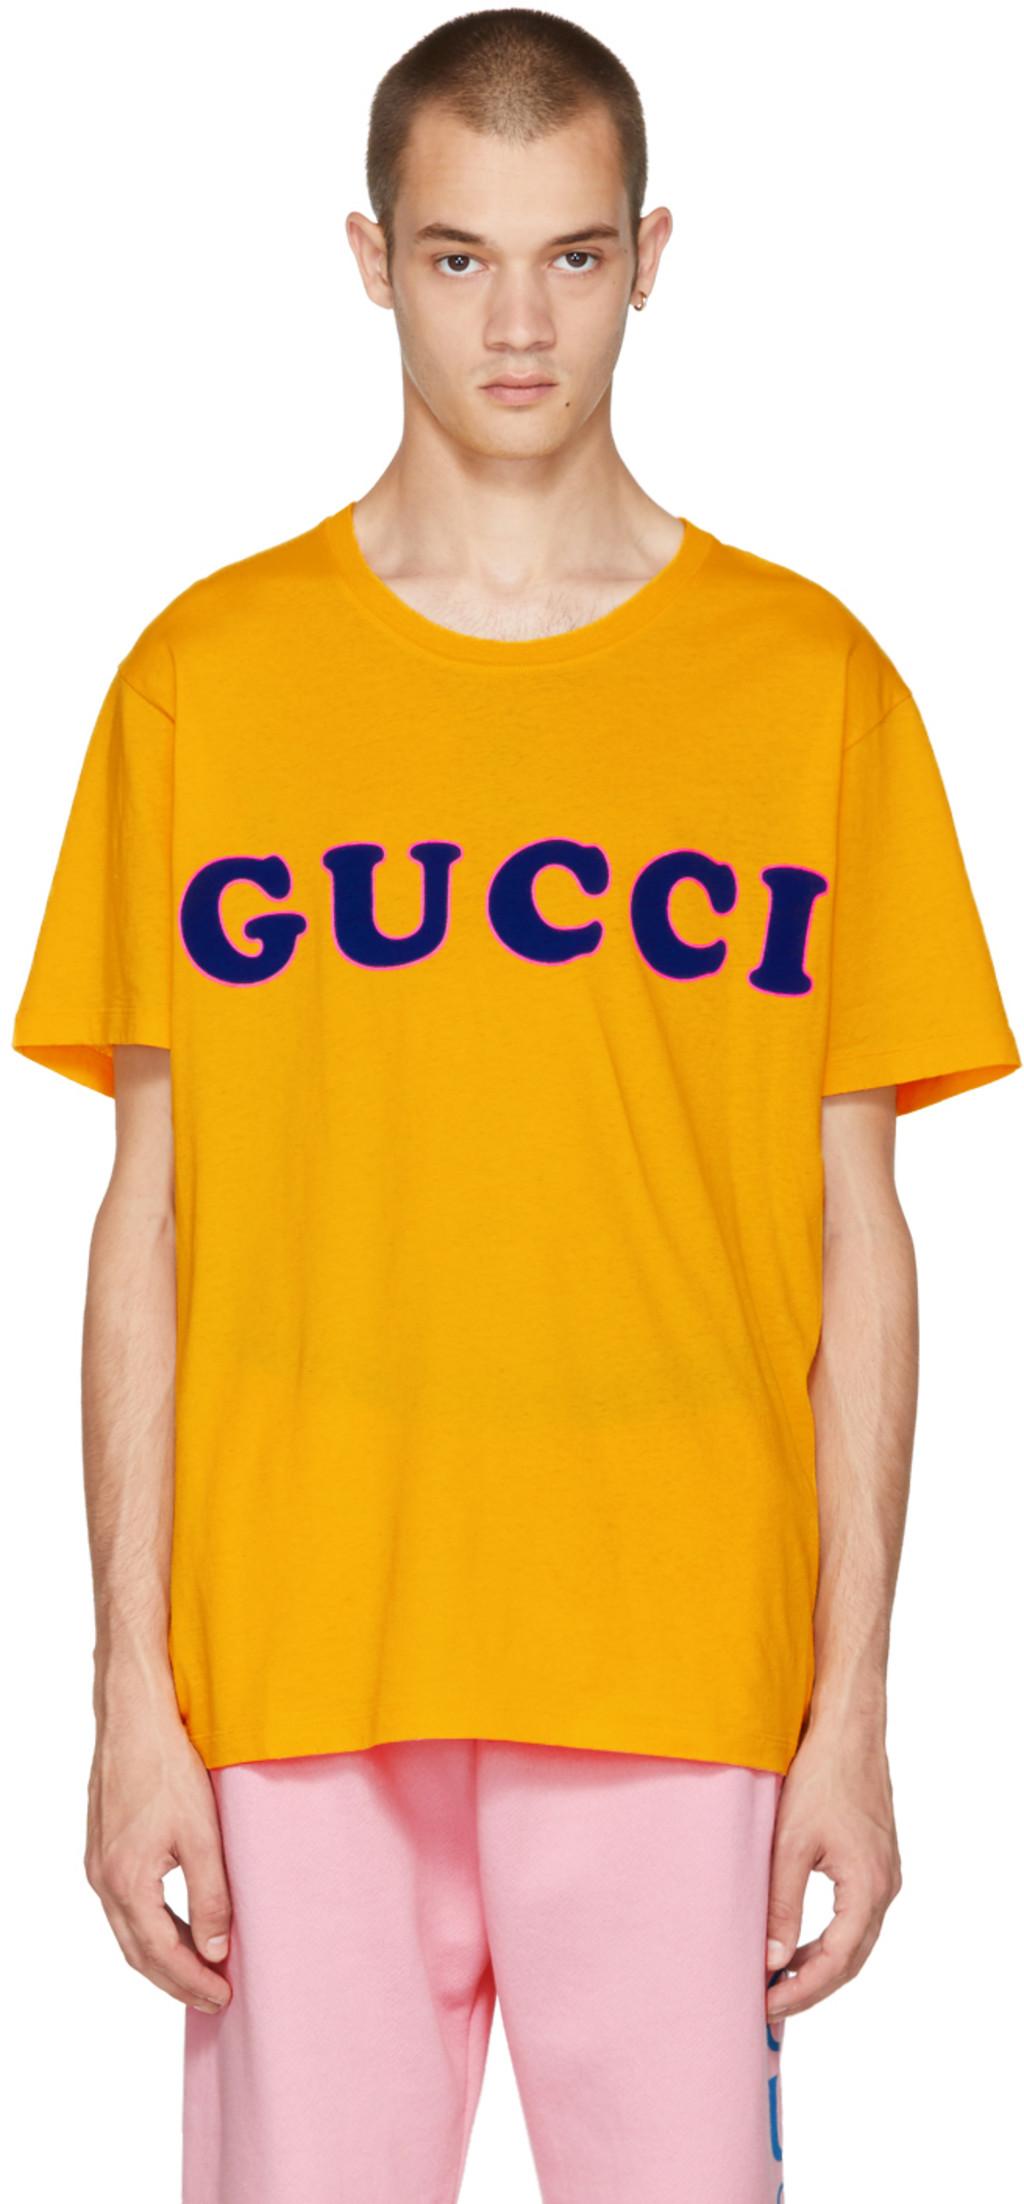 Gucci tops for Men  396acdea0e24